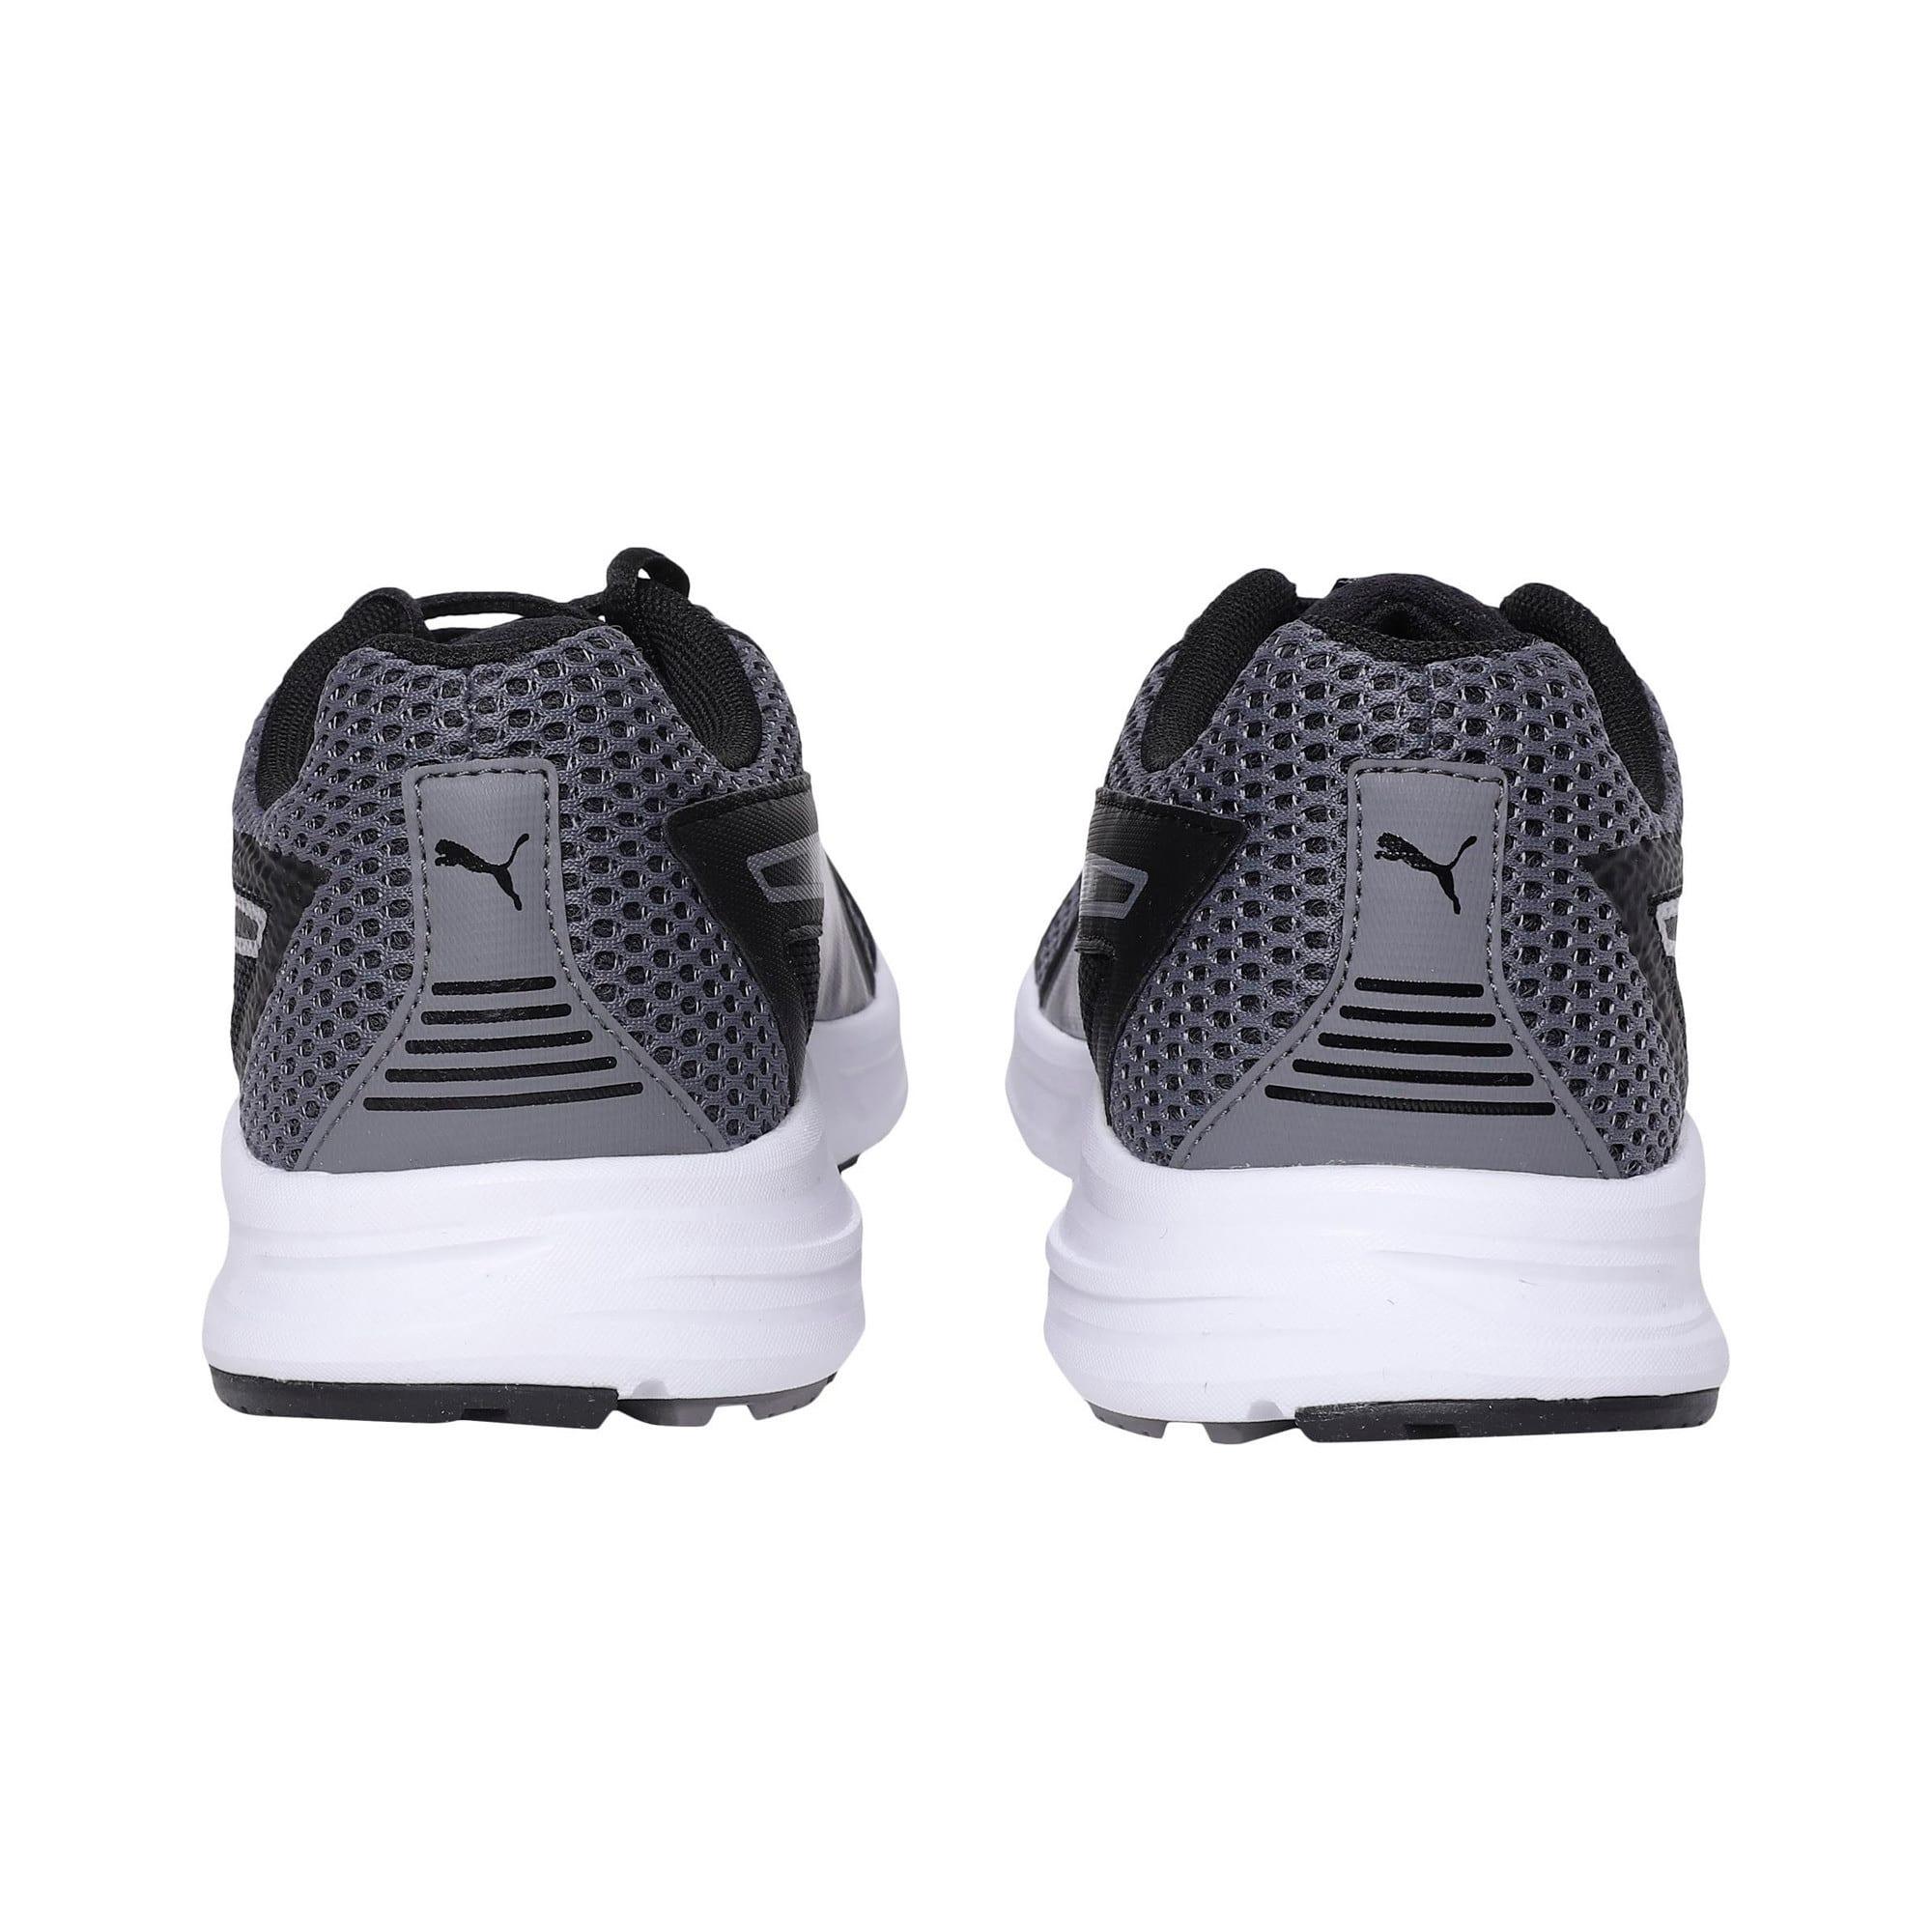 Thumbnail 3 of Essential Runner Men's Running Shoes, QUIET SHADE-Black-Silver, medium-IND